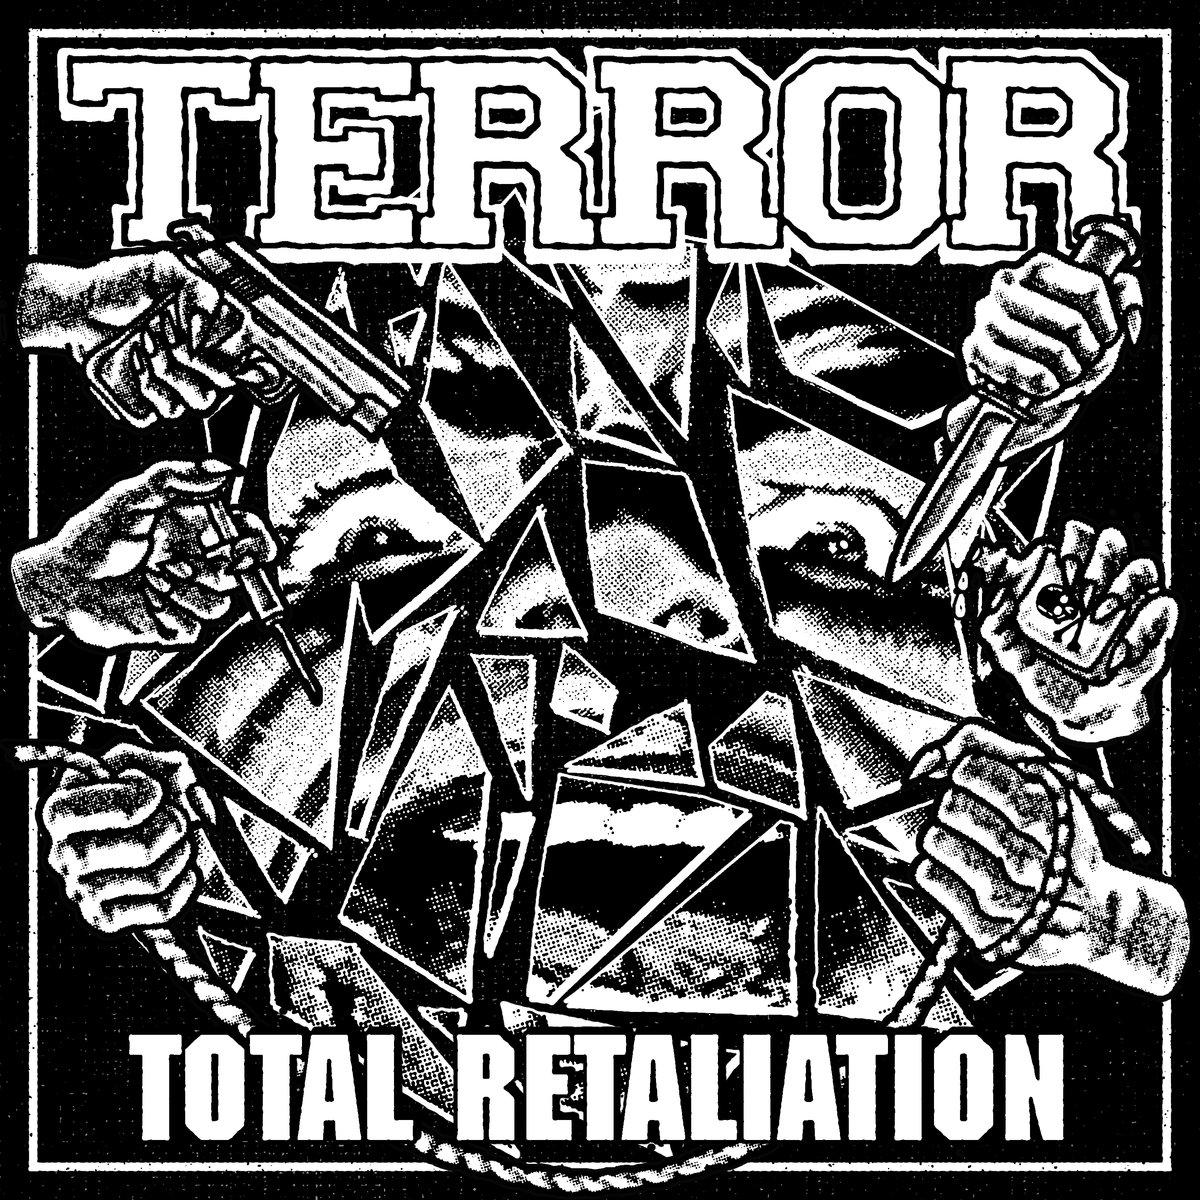 TERROR / Total Retaliation